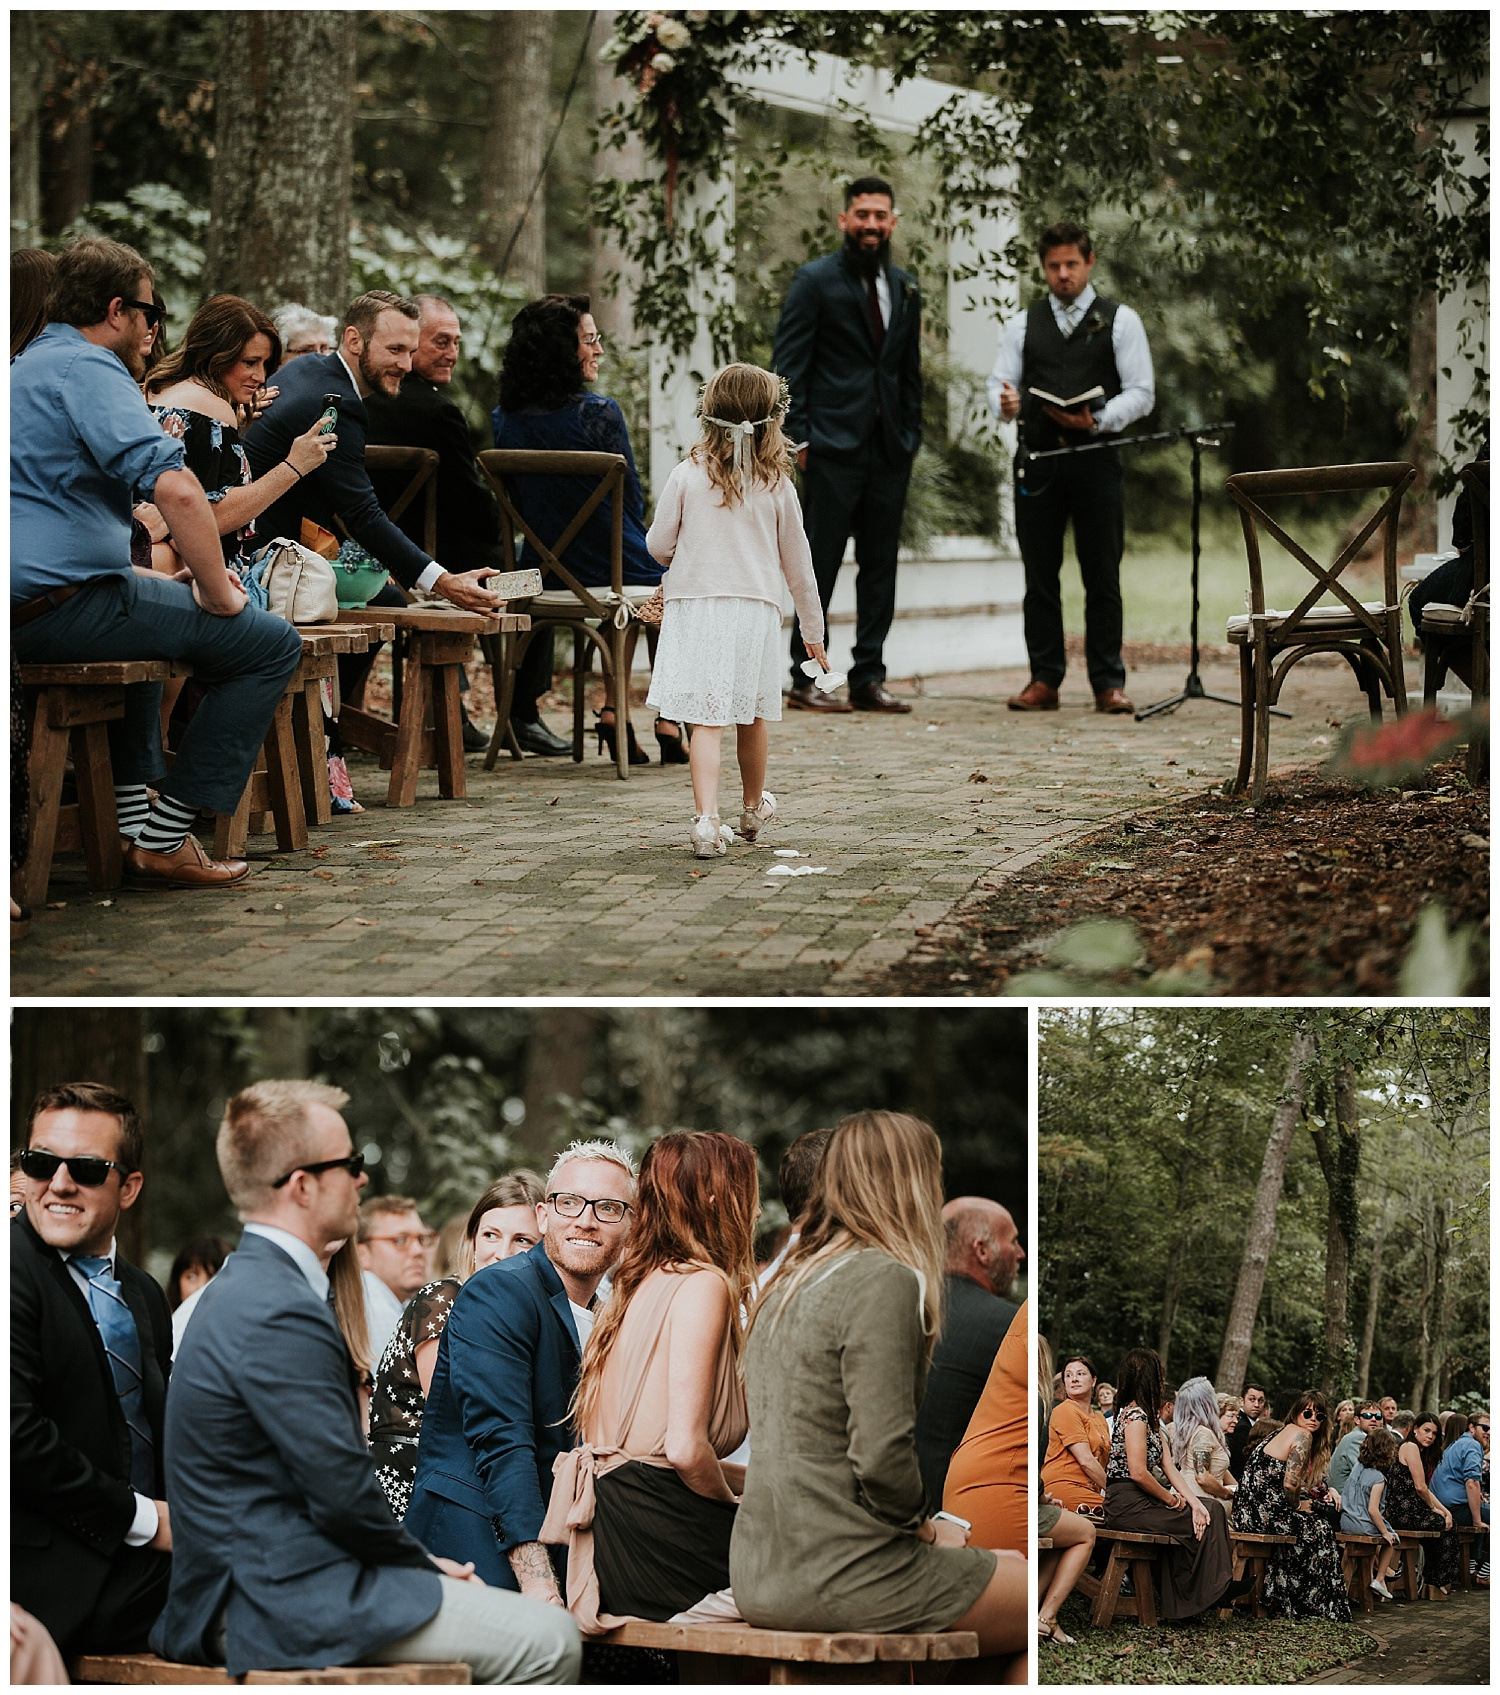 wilmington-nc-wedding-photographer-ethang-gaskill.jpg